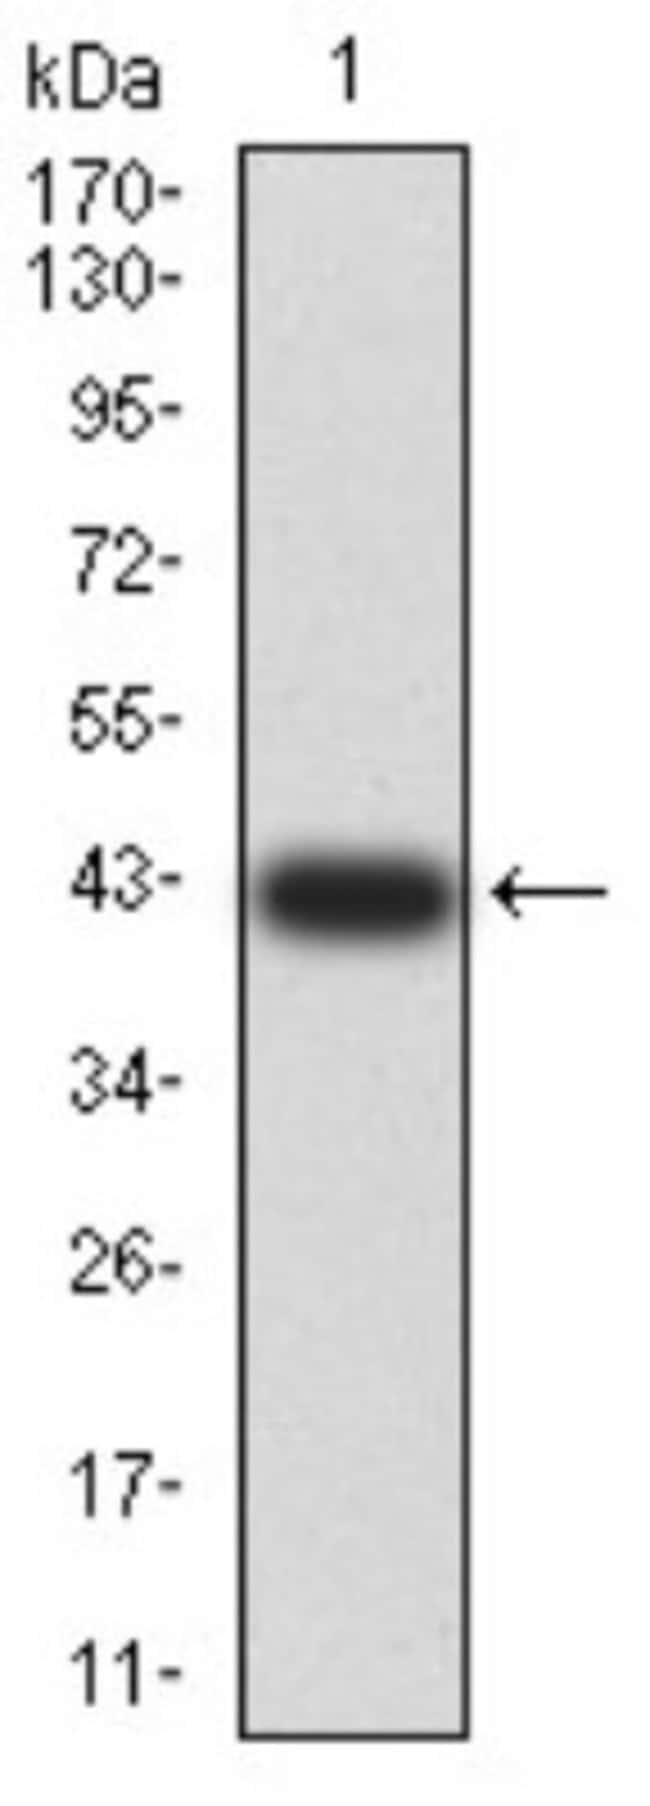 AEBP2 Mouse anti-Human, Clone: 3E3C10, Novus Biologicals 0.1 ml; Unconjugated:Antibodies